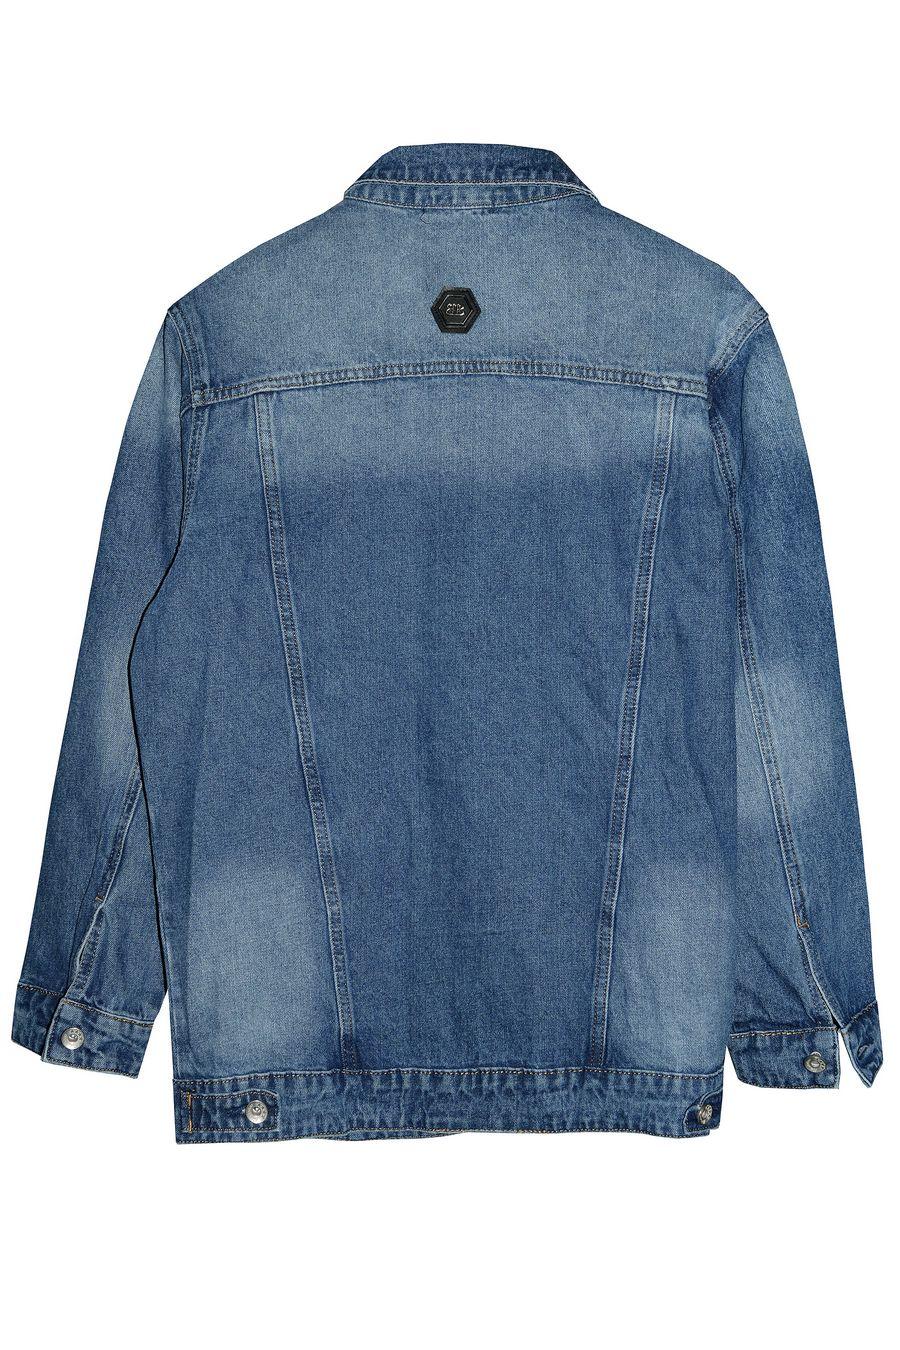 Куртка женская Blue Coco 121 - фото 2